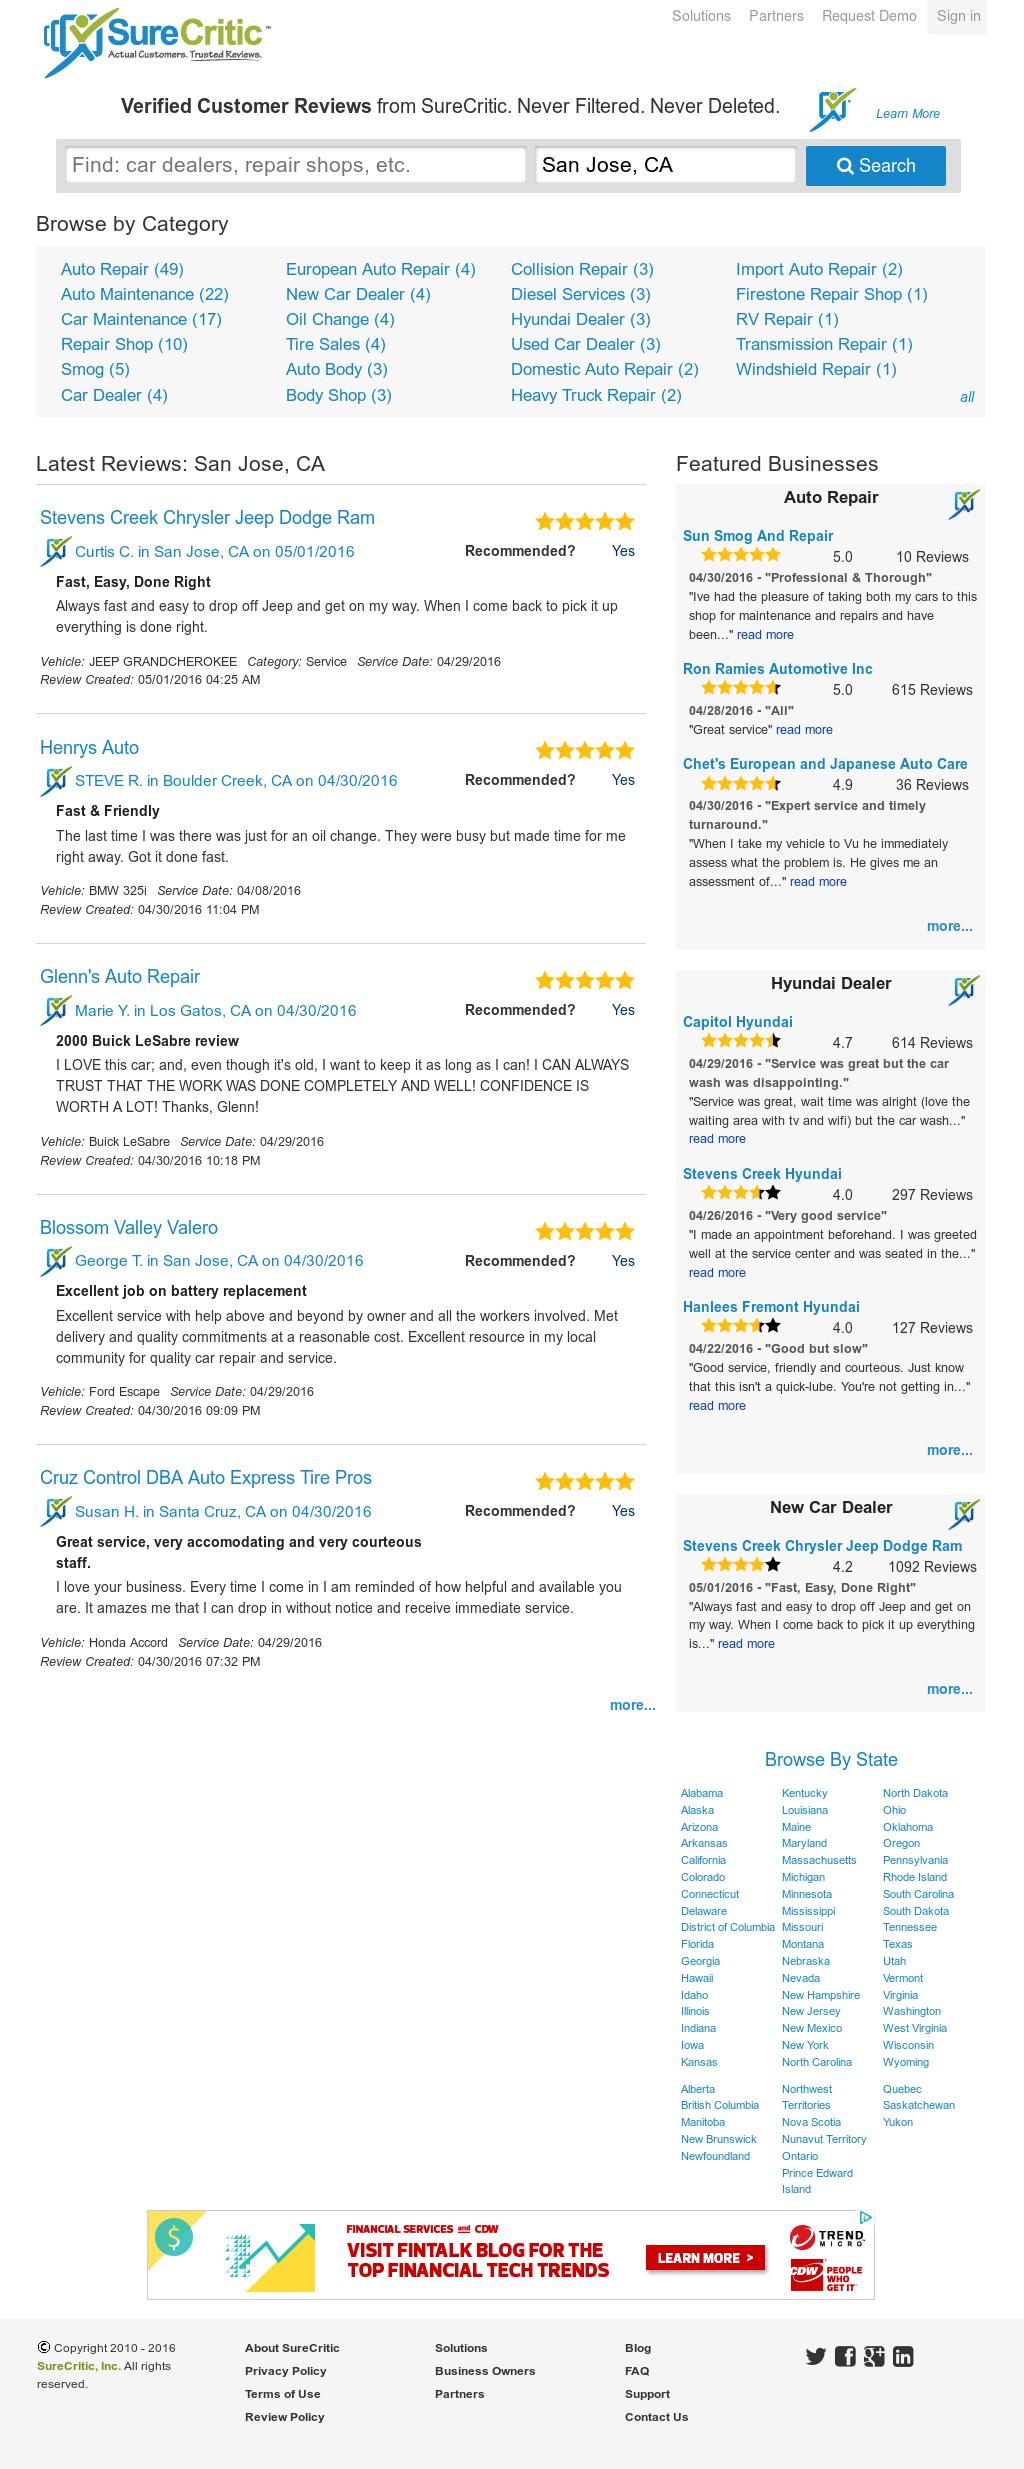 Surecritic Competitors, Revenue and Employees - Owler Company Profile